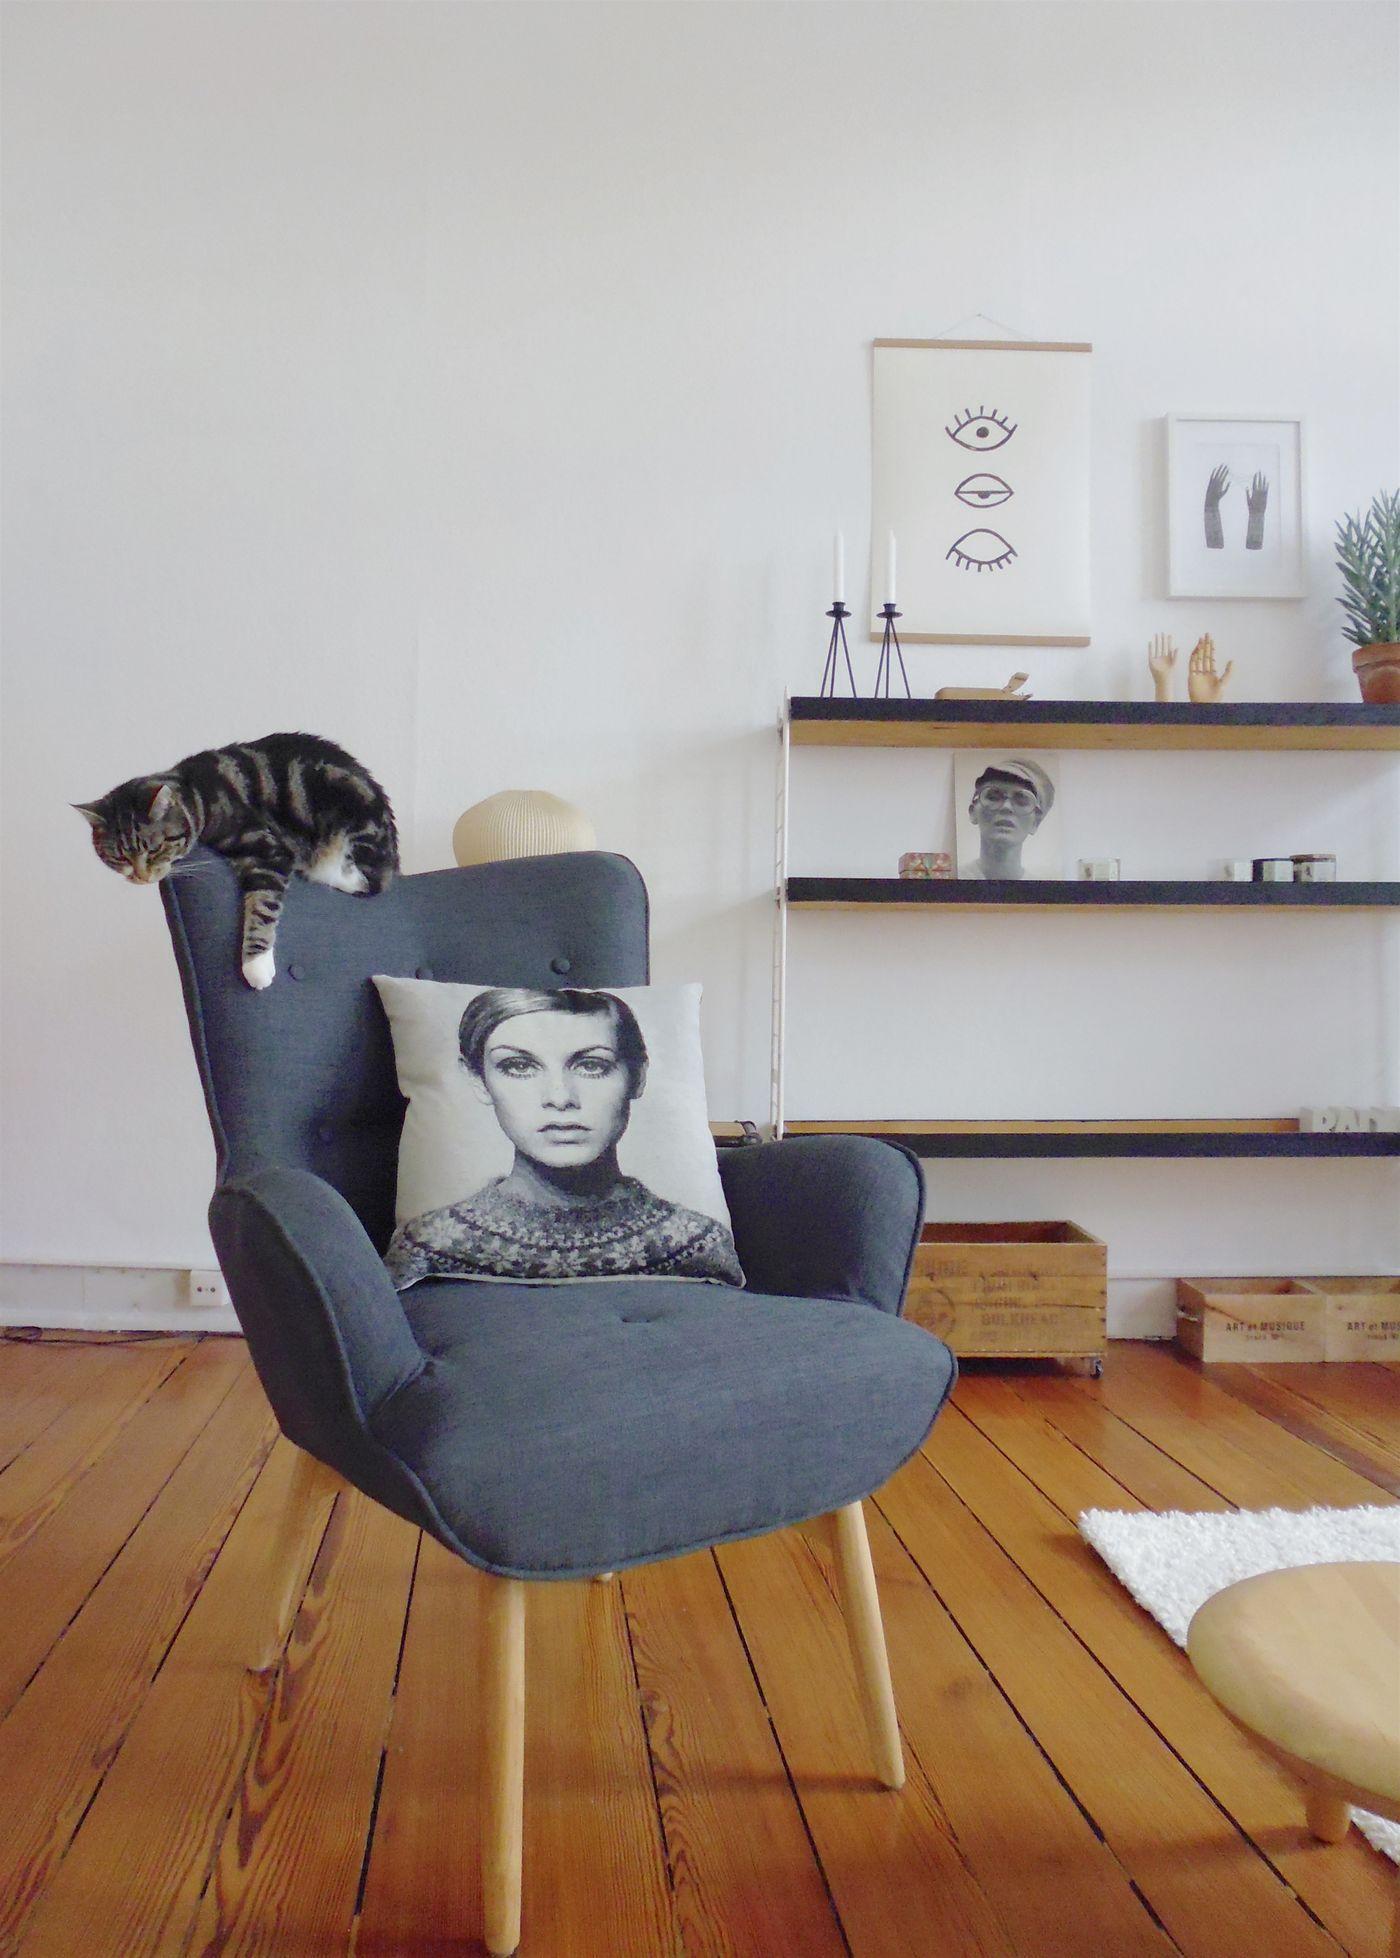 holzkisten deko ber 100 ideen. Black Bedroom Furniture Sets. Home Design Ideas